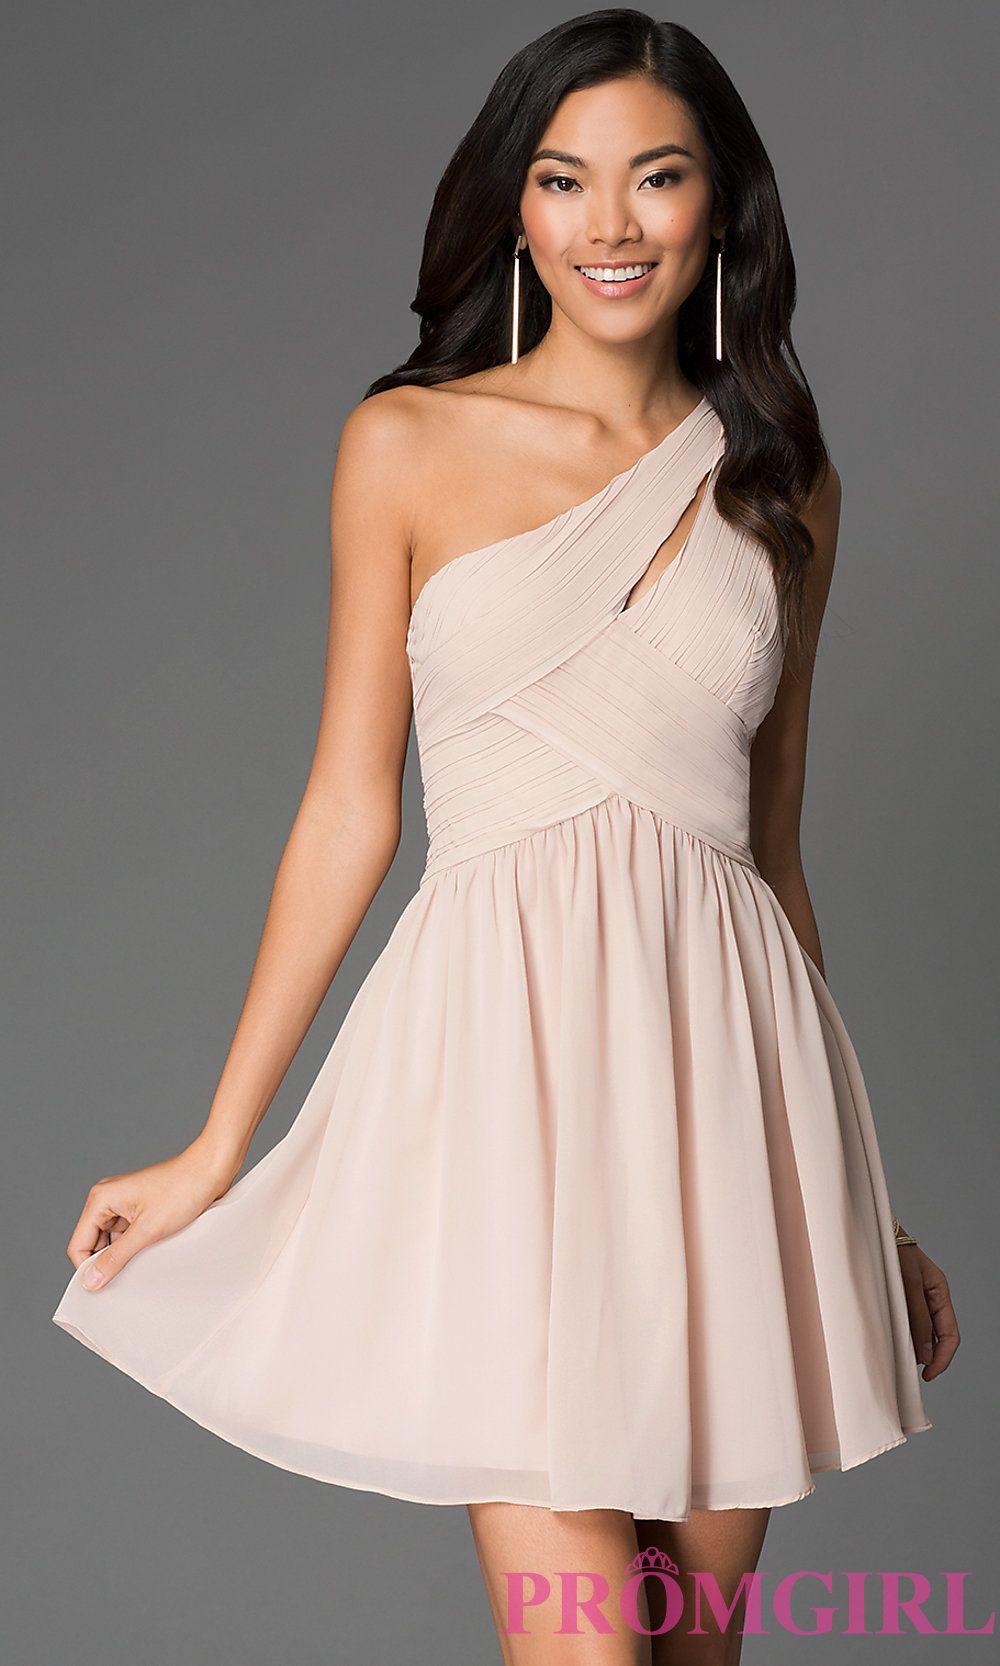 Short one shoulder dress junior prom dress promgirl jr short one shoulder dress junior prom dress promgirl ombrellifo Choice Image